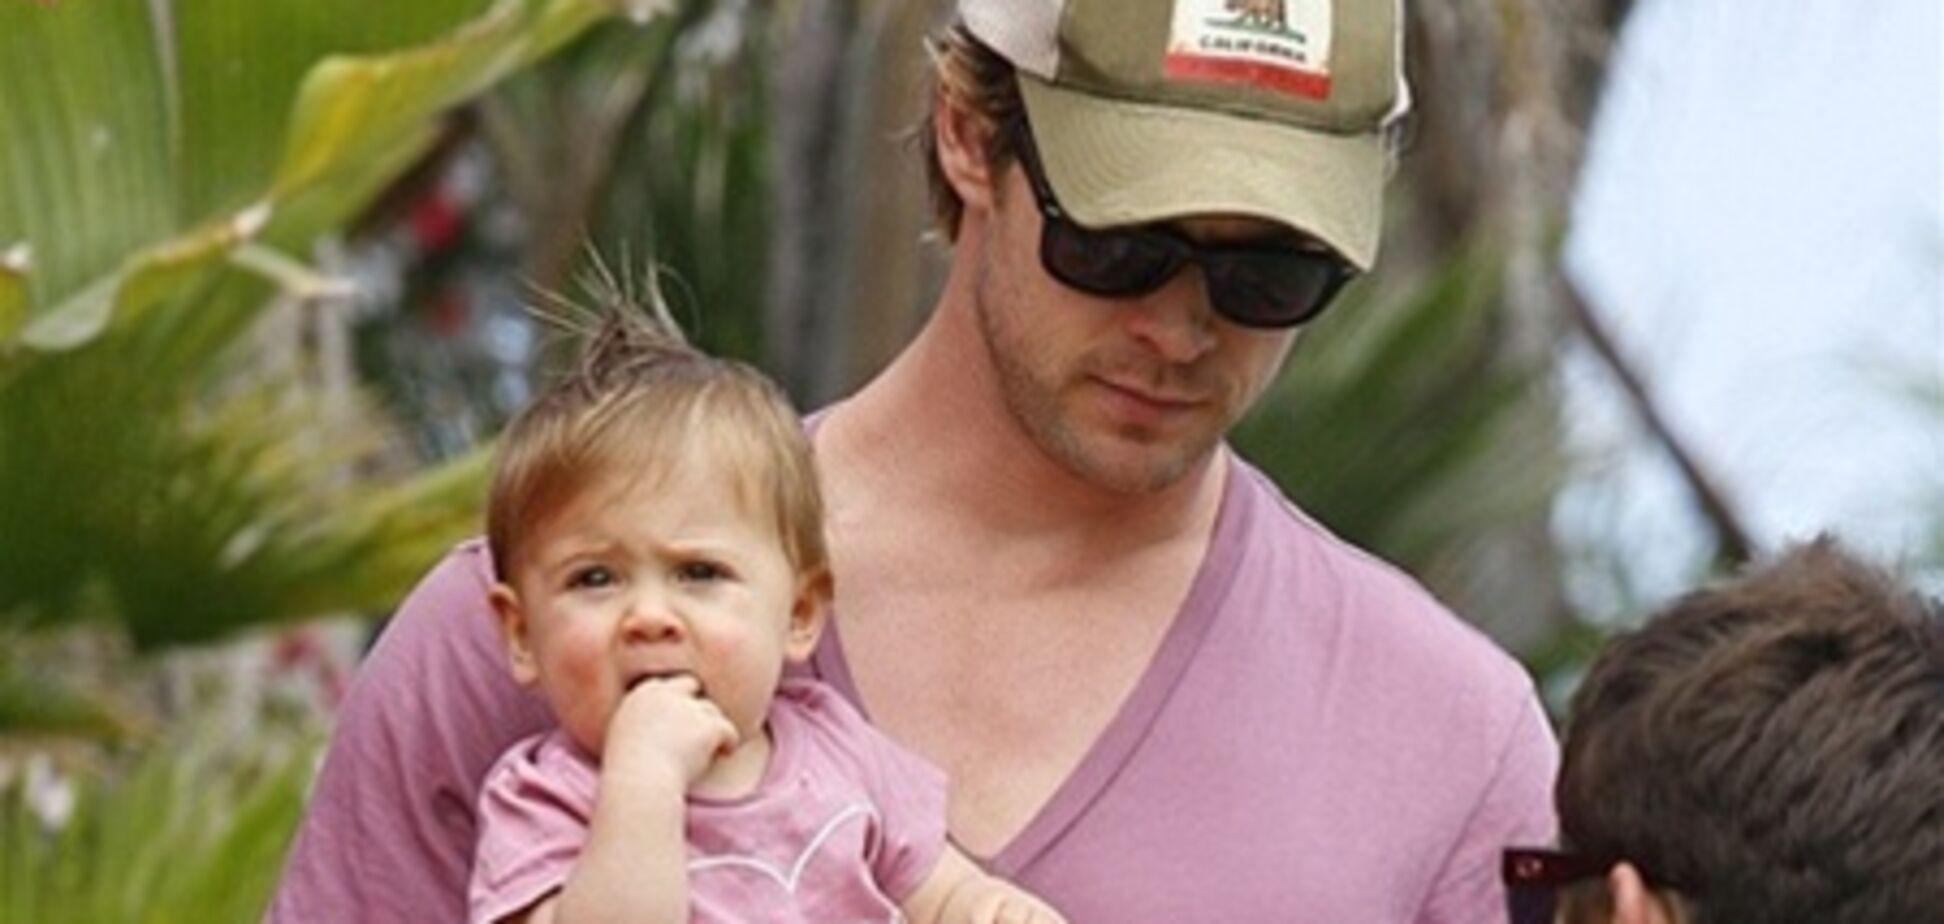 Крис Хемсворт надел такую же футболку, как у дочери